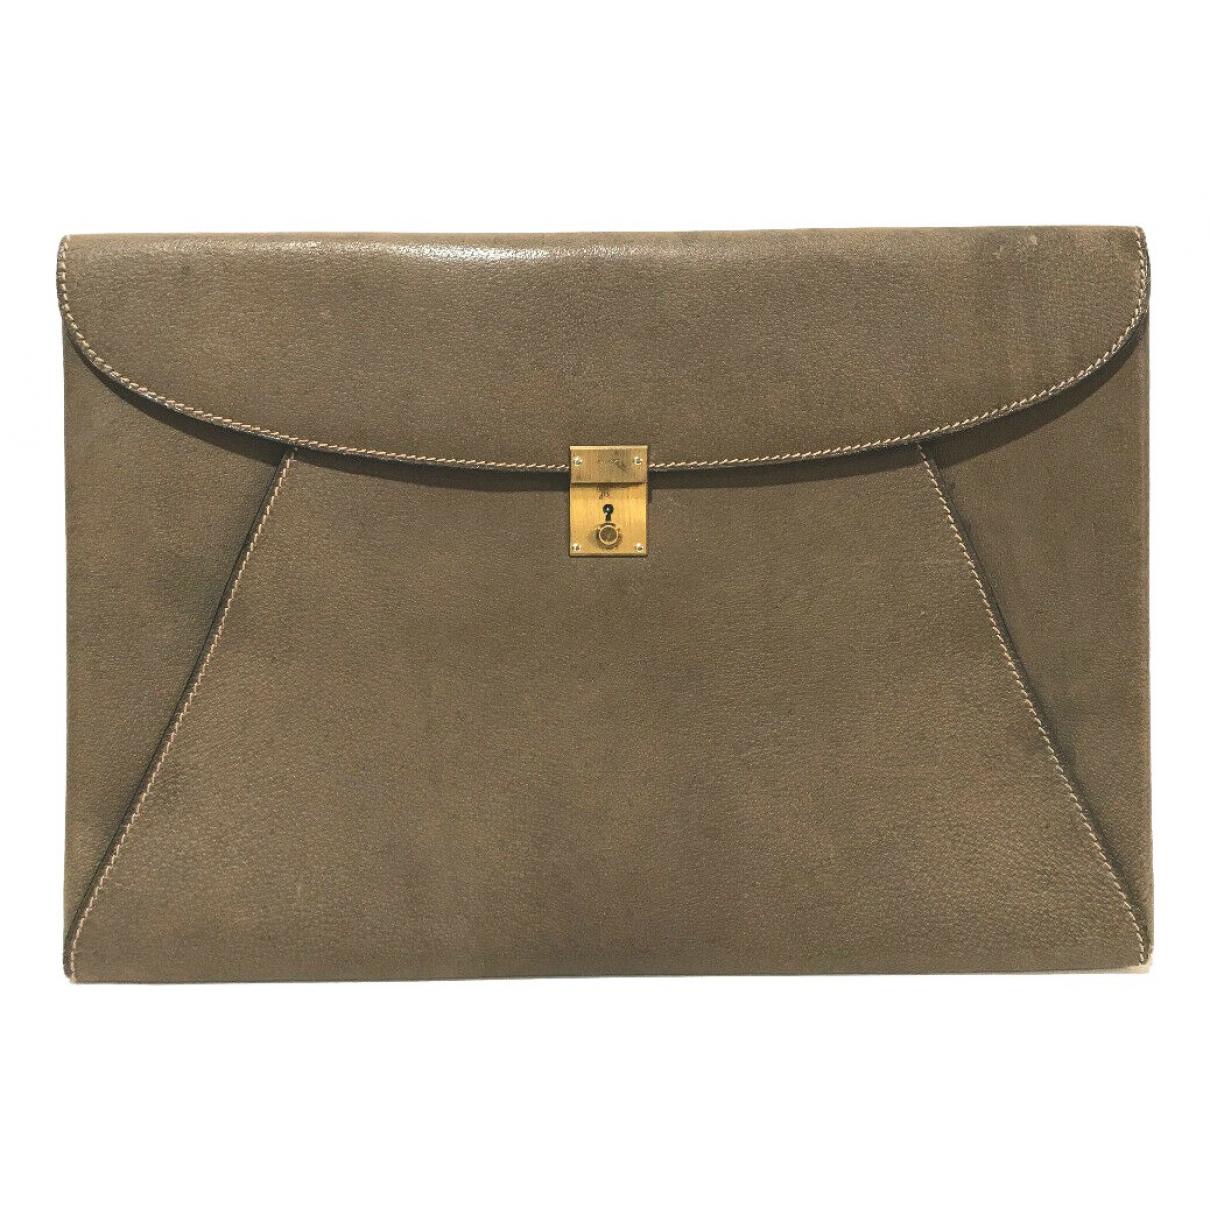 Gucci N Brown Leather Clutch bag for Women N